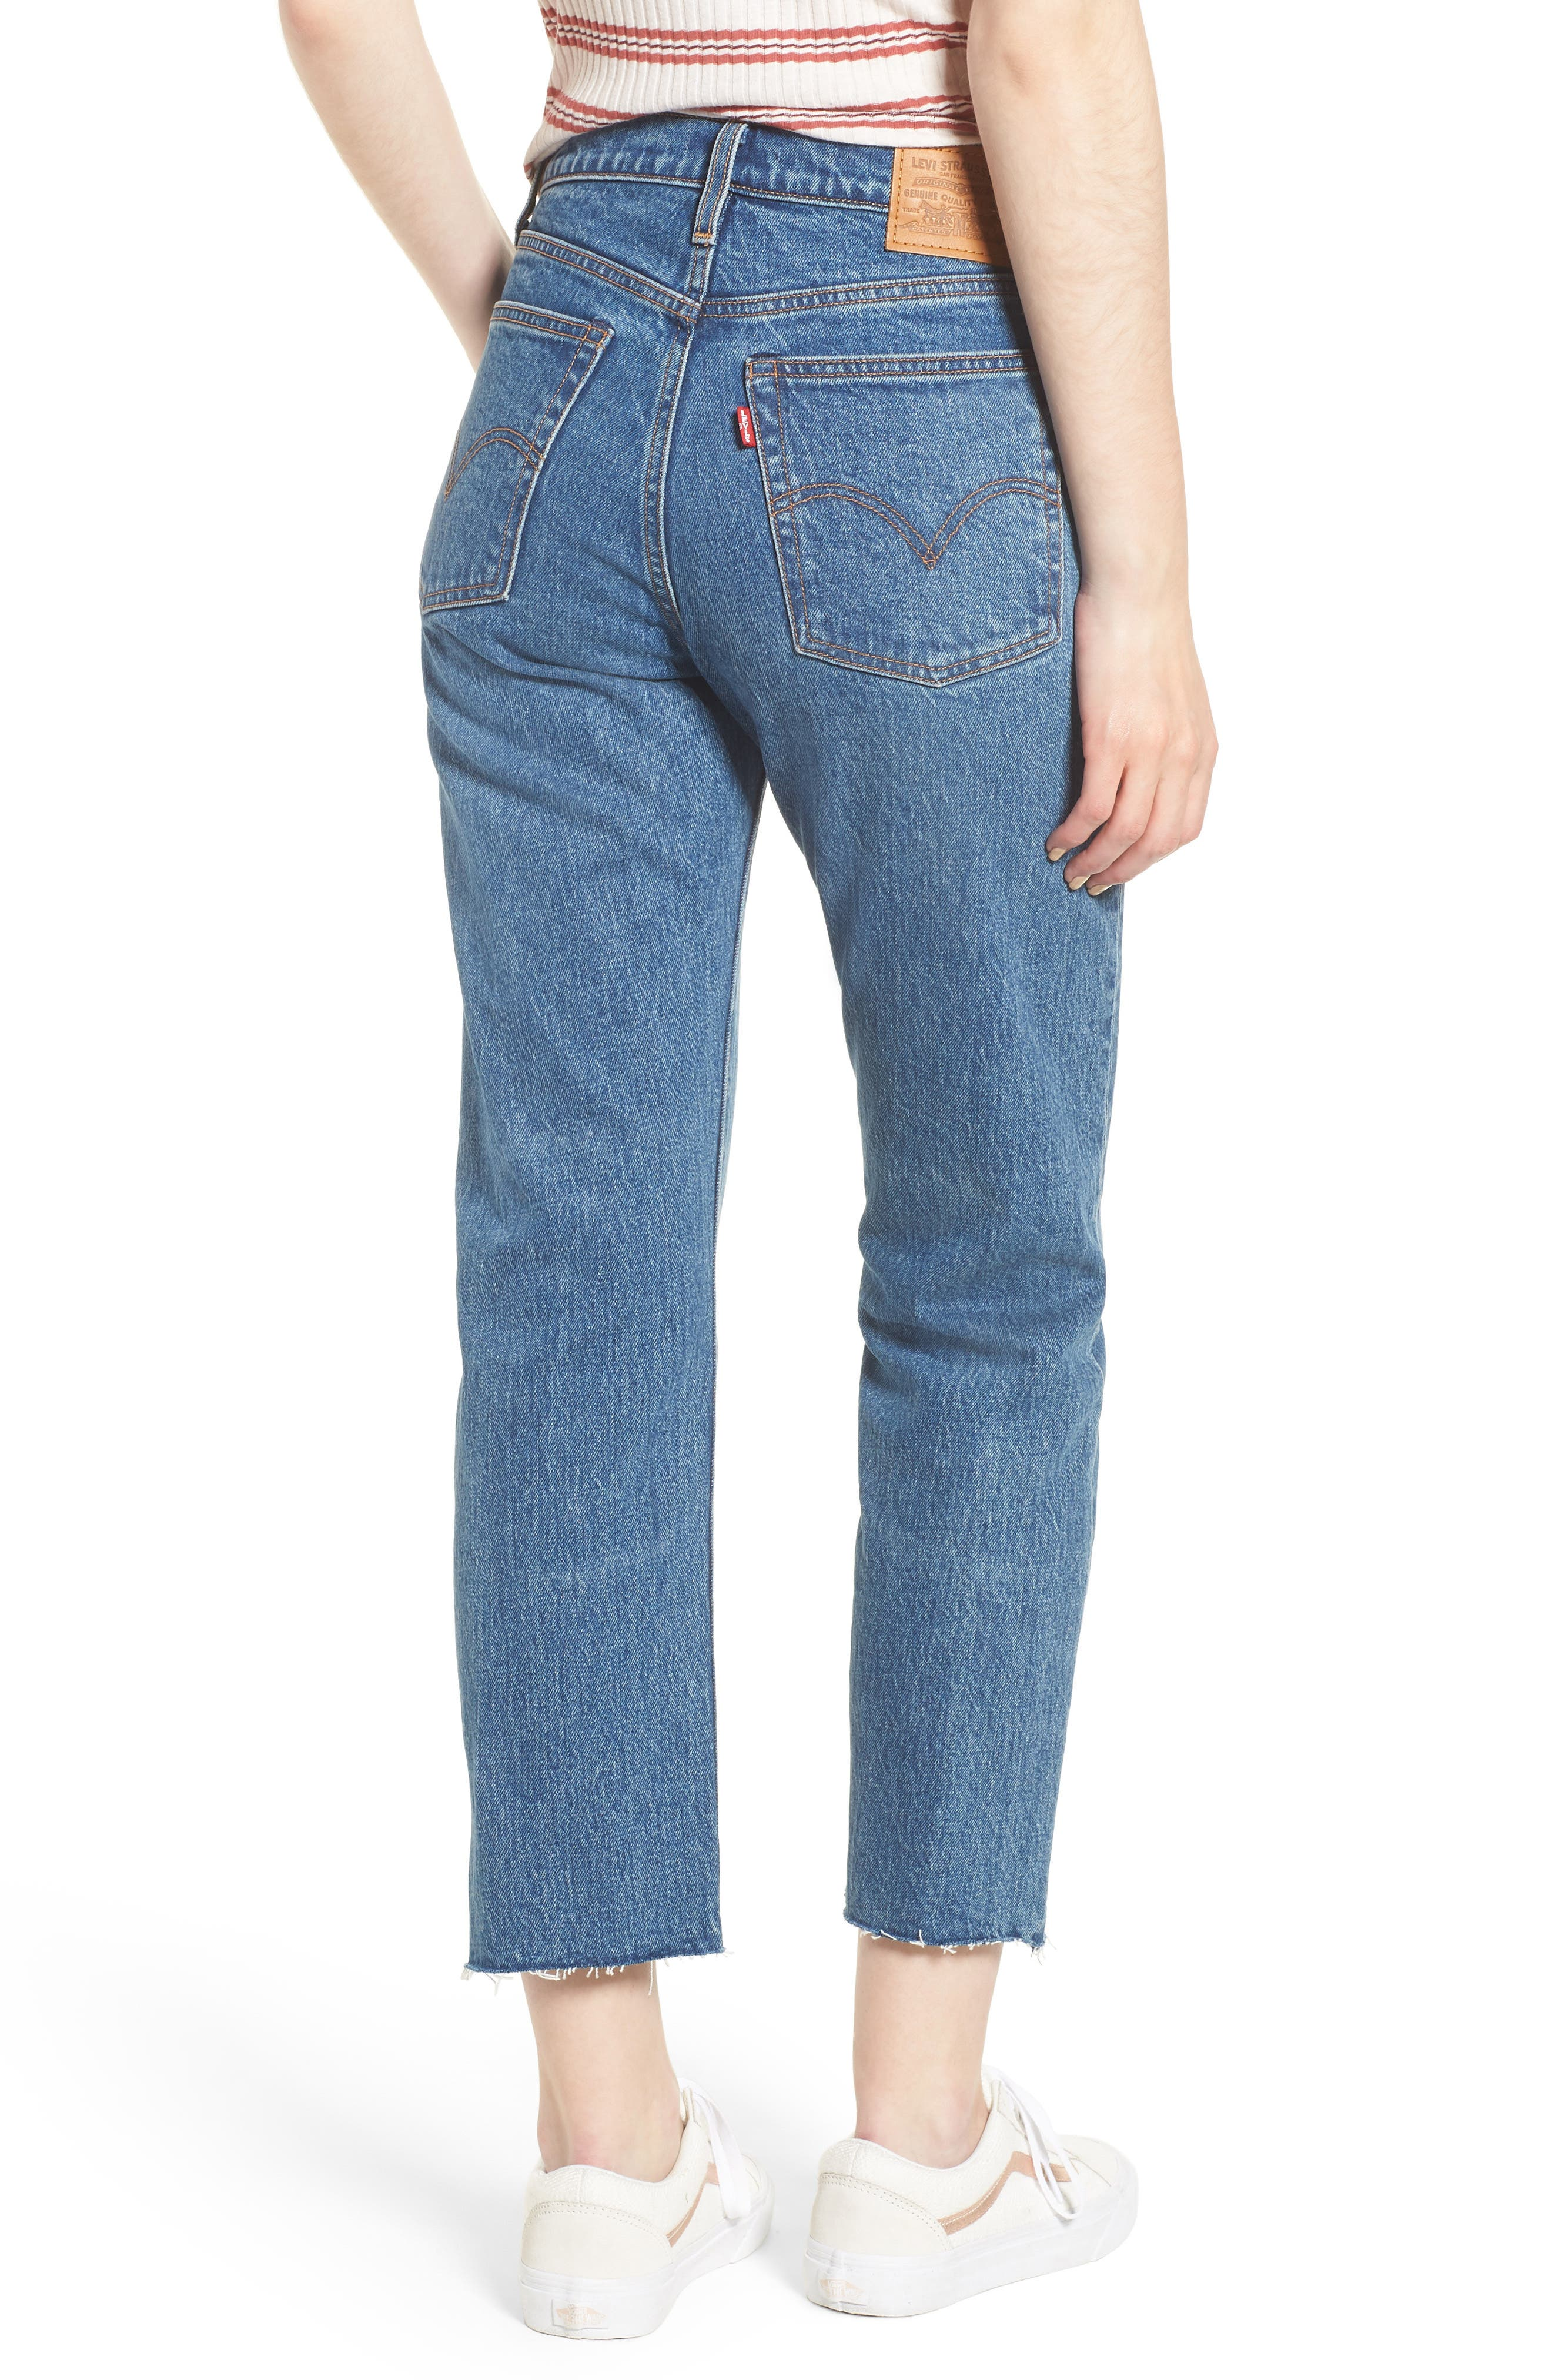 LEVI'S<SUP>®</SUP>, Wedgie Raw Hem High Waist Straight Leg Jeans, Alternate thumbnail 2, color, LOVE TRIANGLE